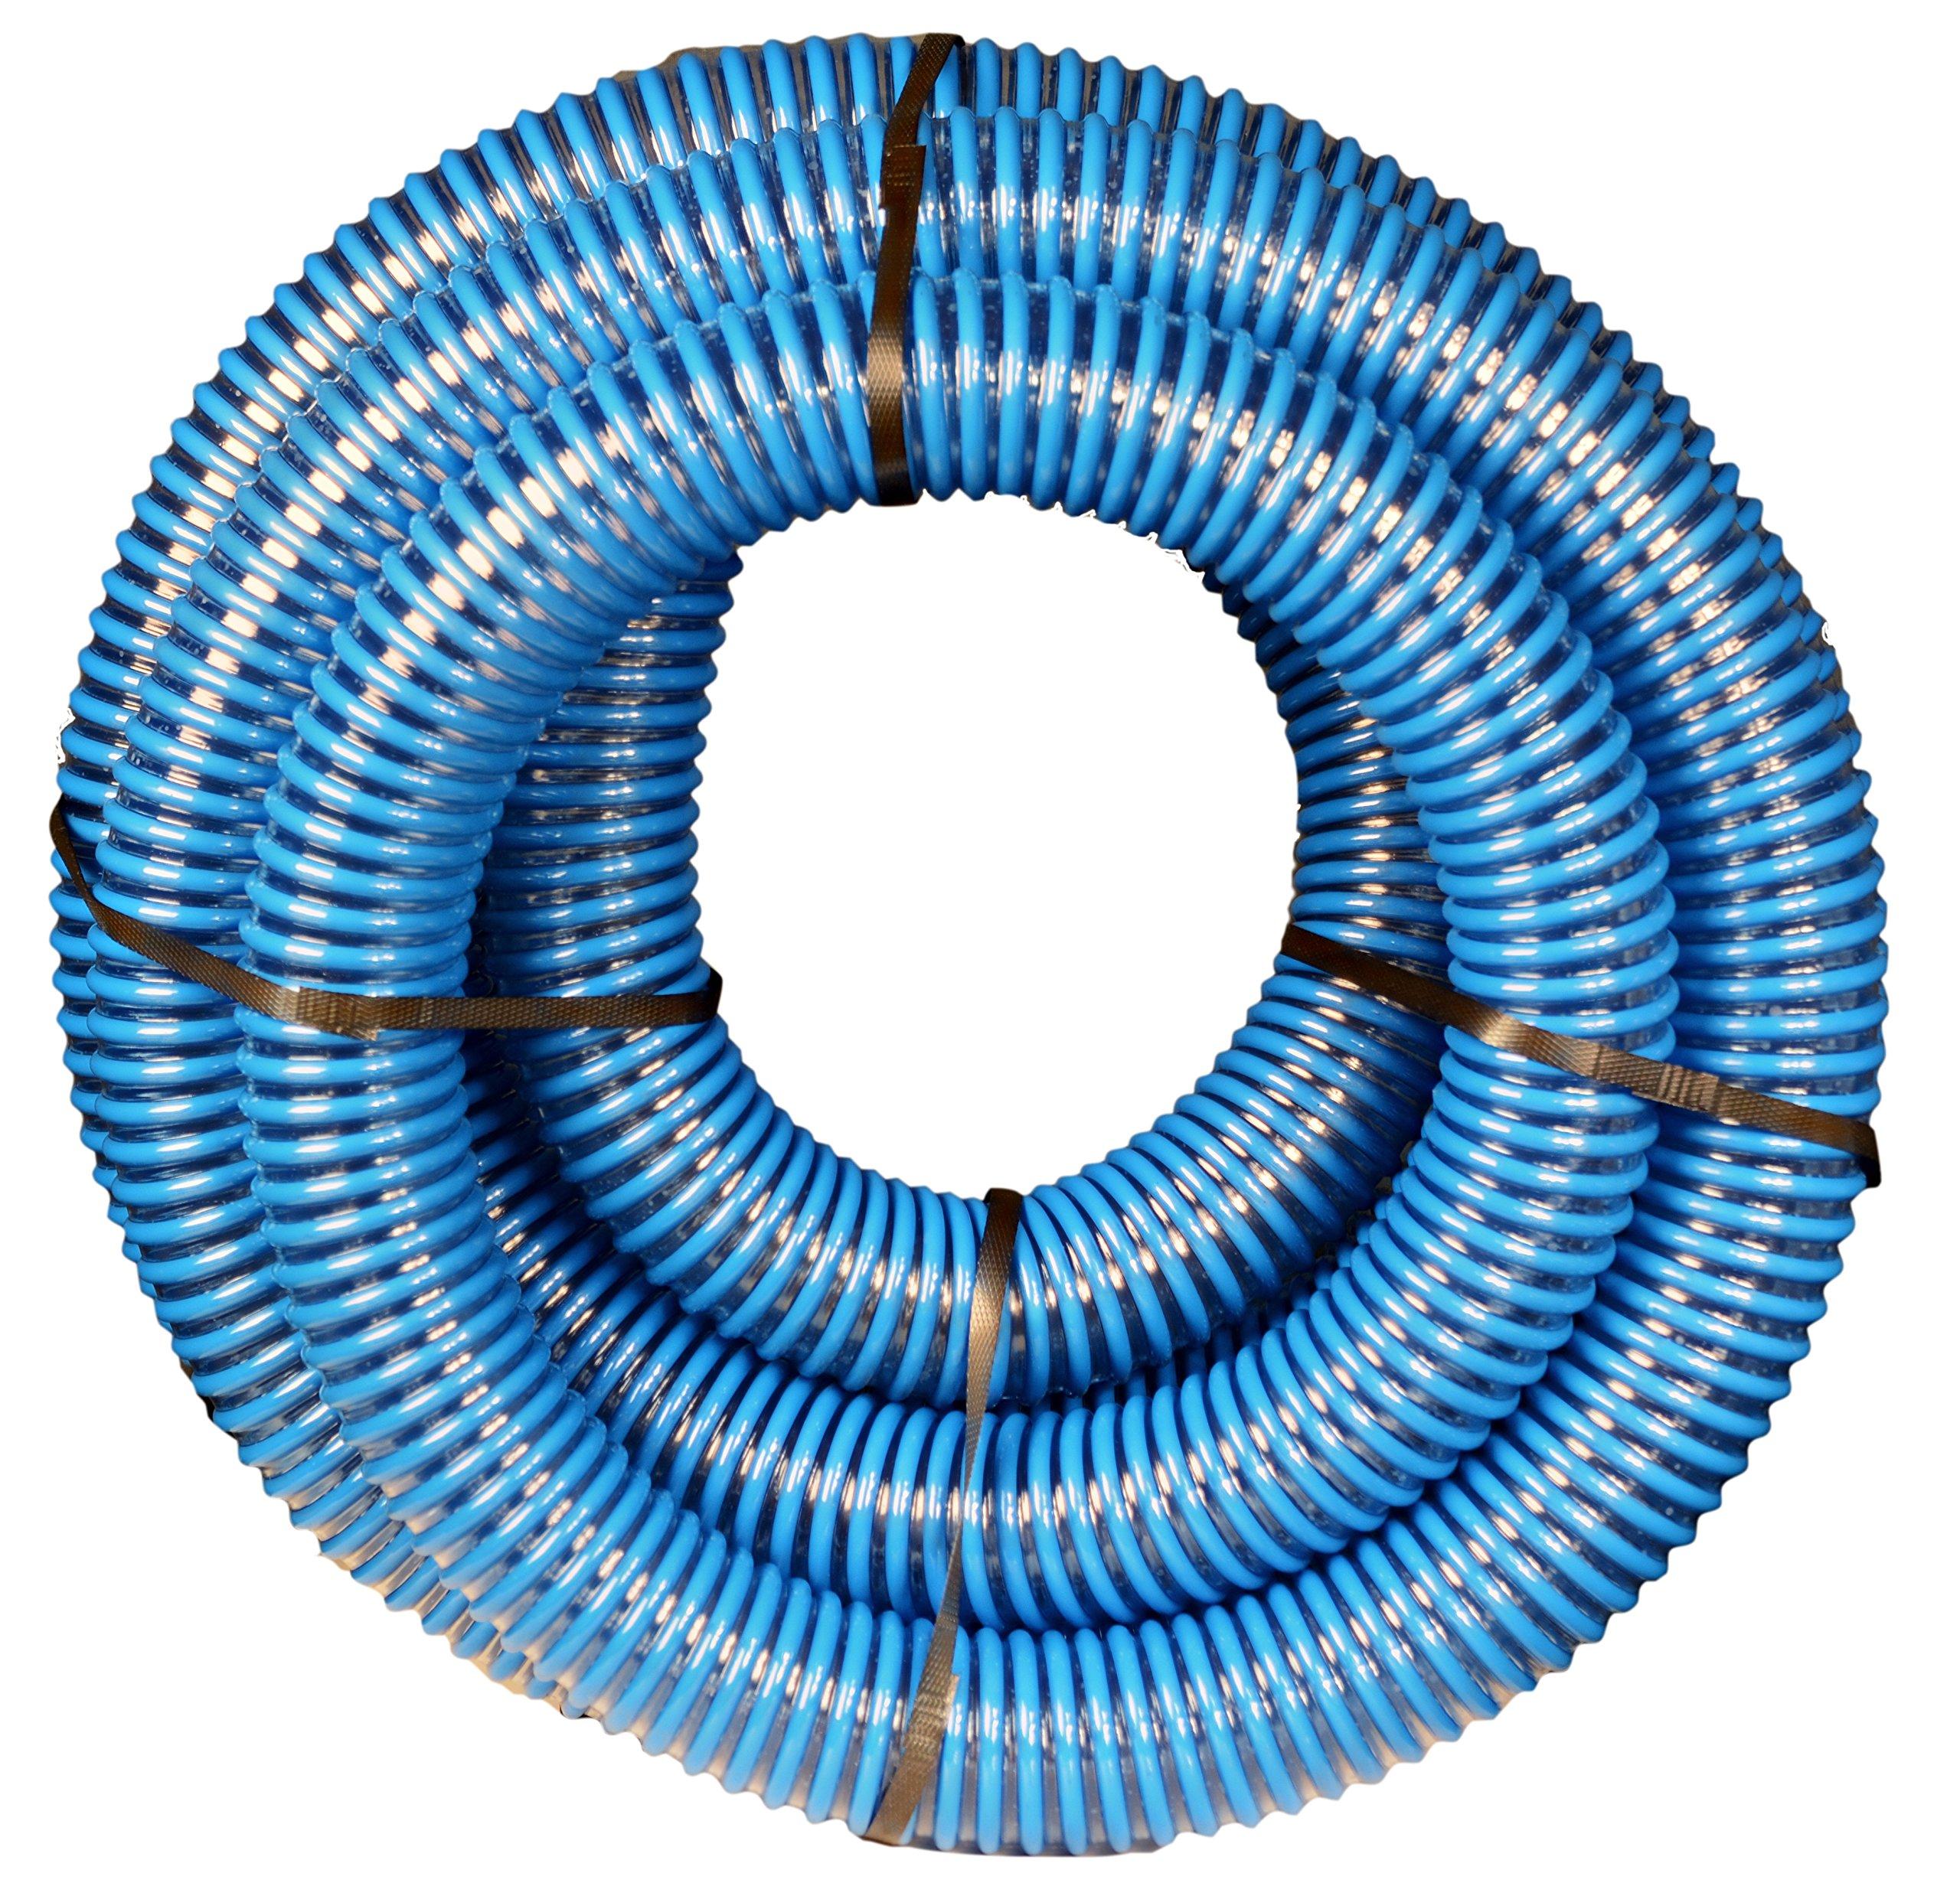 Apache 98106501 PVC Suction Aluminum Short Shank Hose, 40 psi, 2'' Inside Diameter, Blue